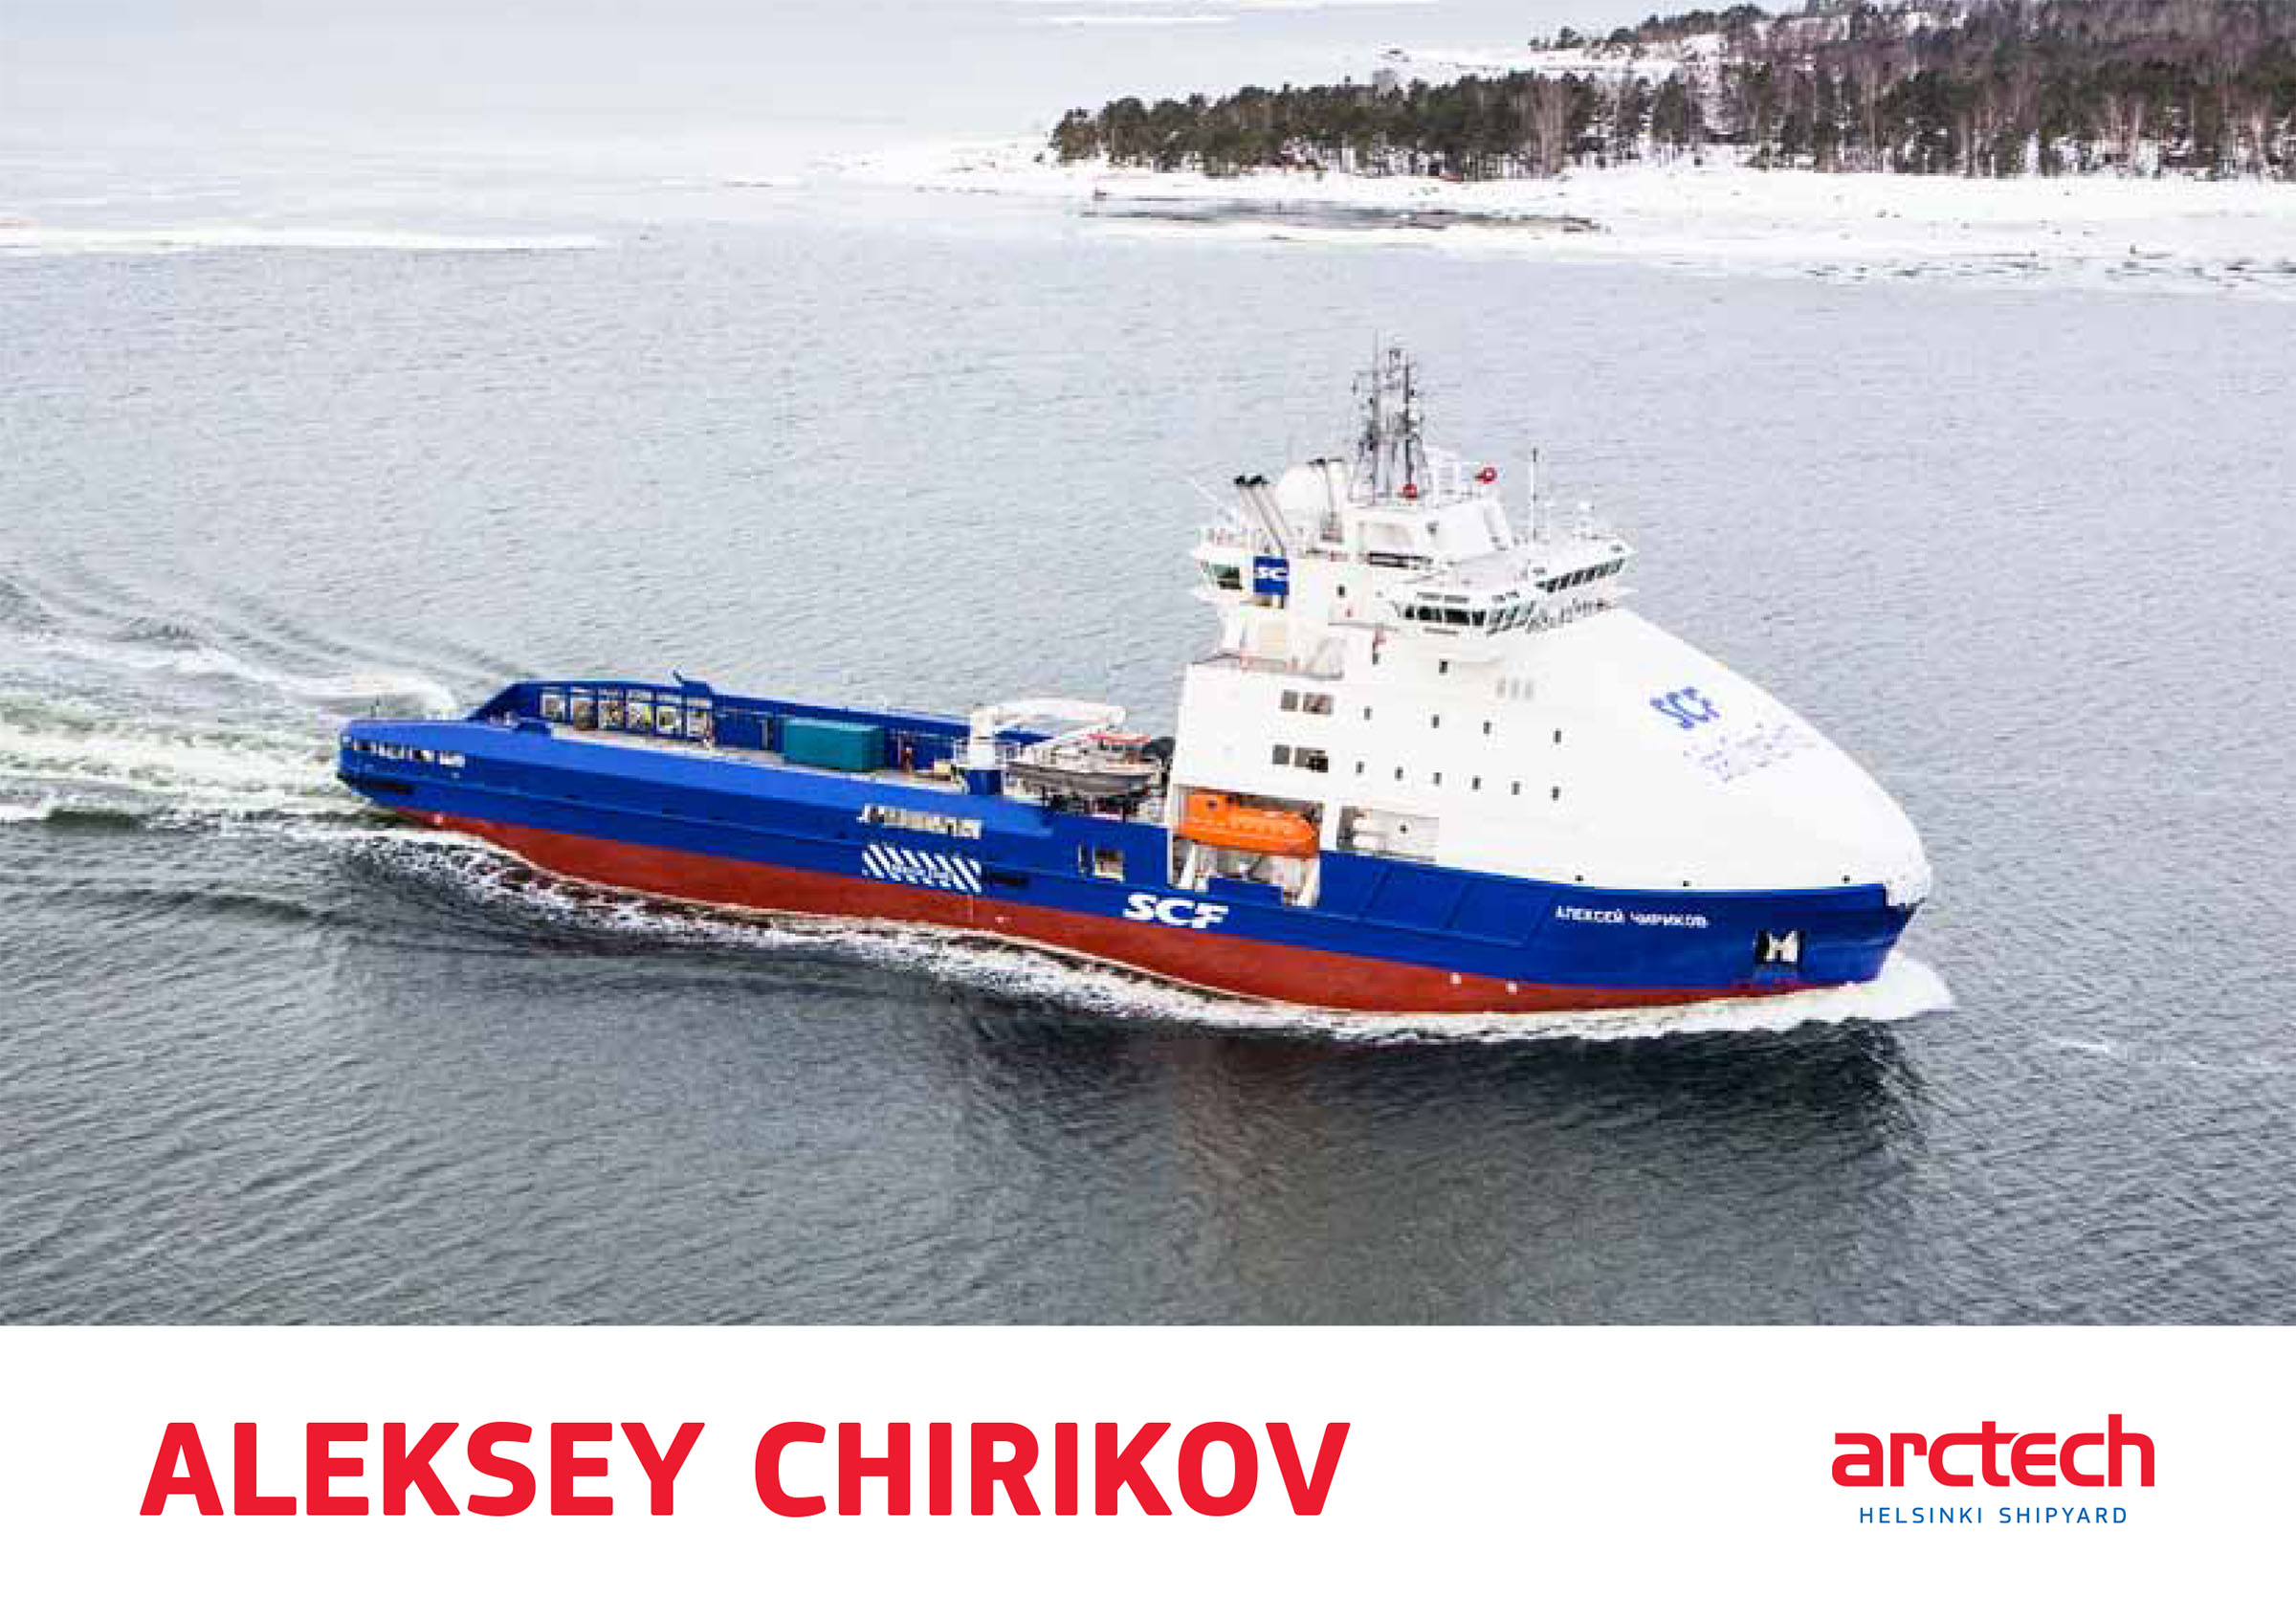 Aleksey_Chirikov_1.jpg